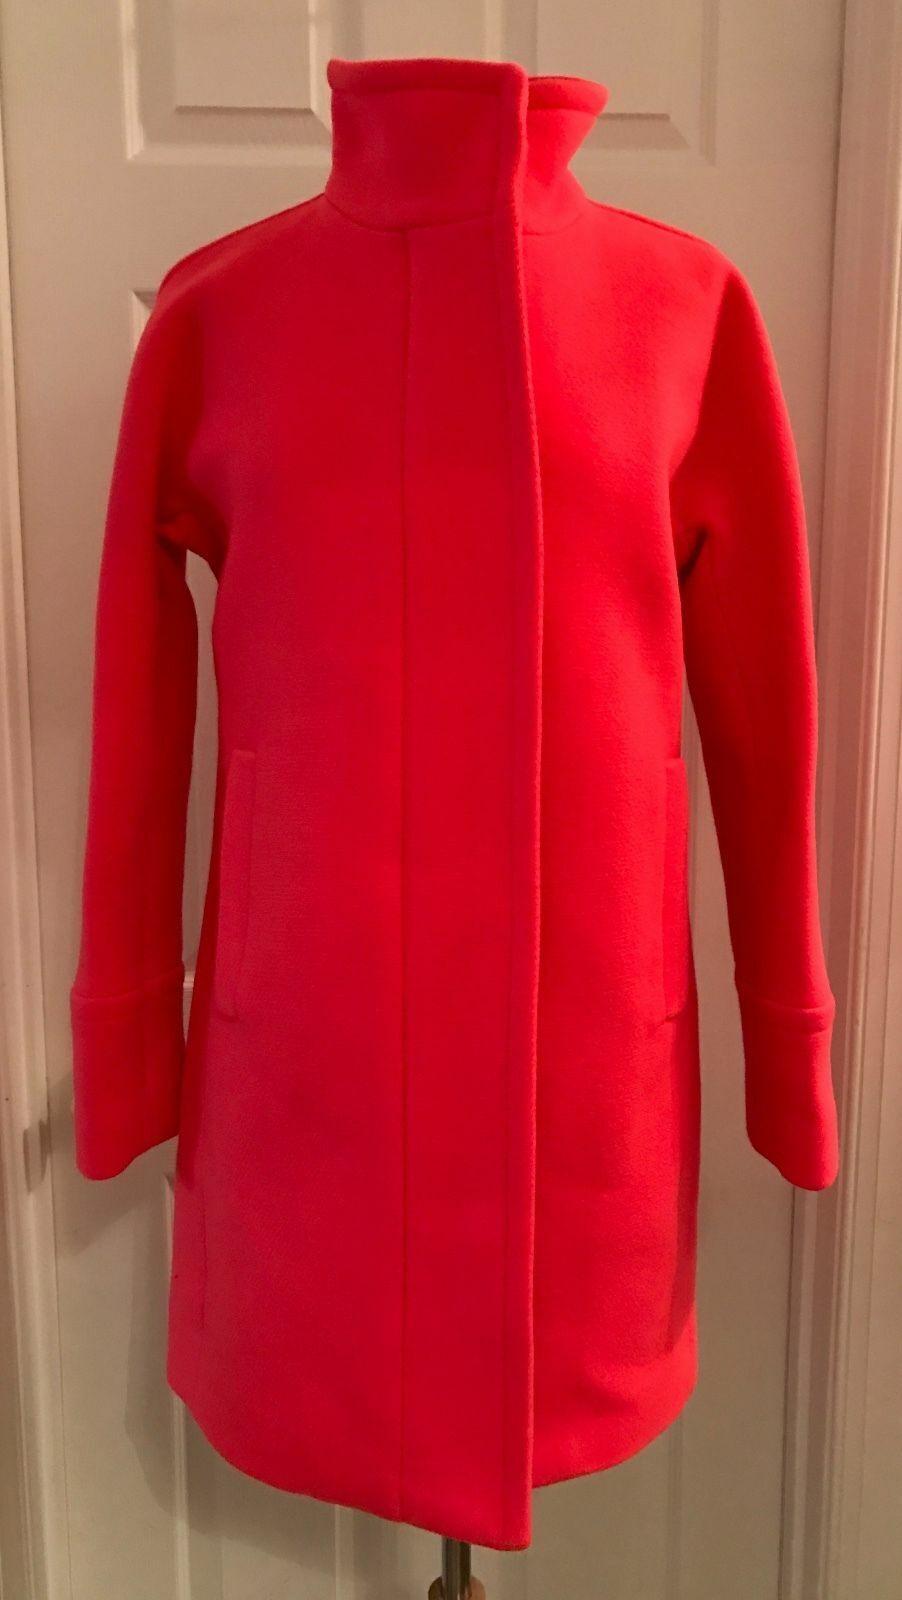 J.CREW STADIUM-CLOTH COCOON COAT Sz 10 SPACED orange B2770